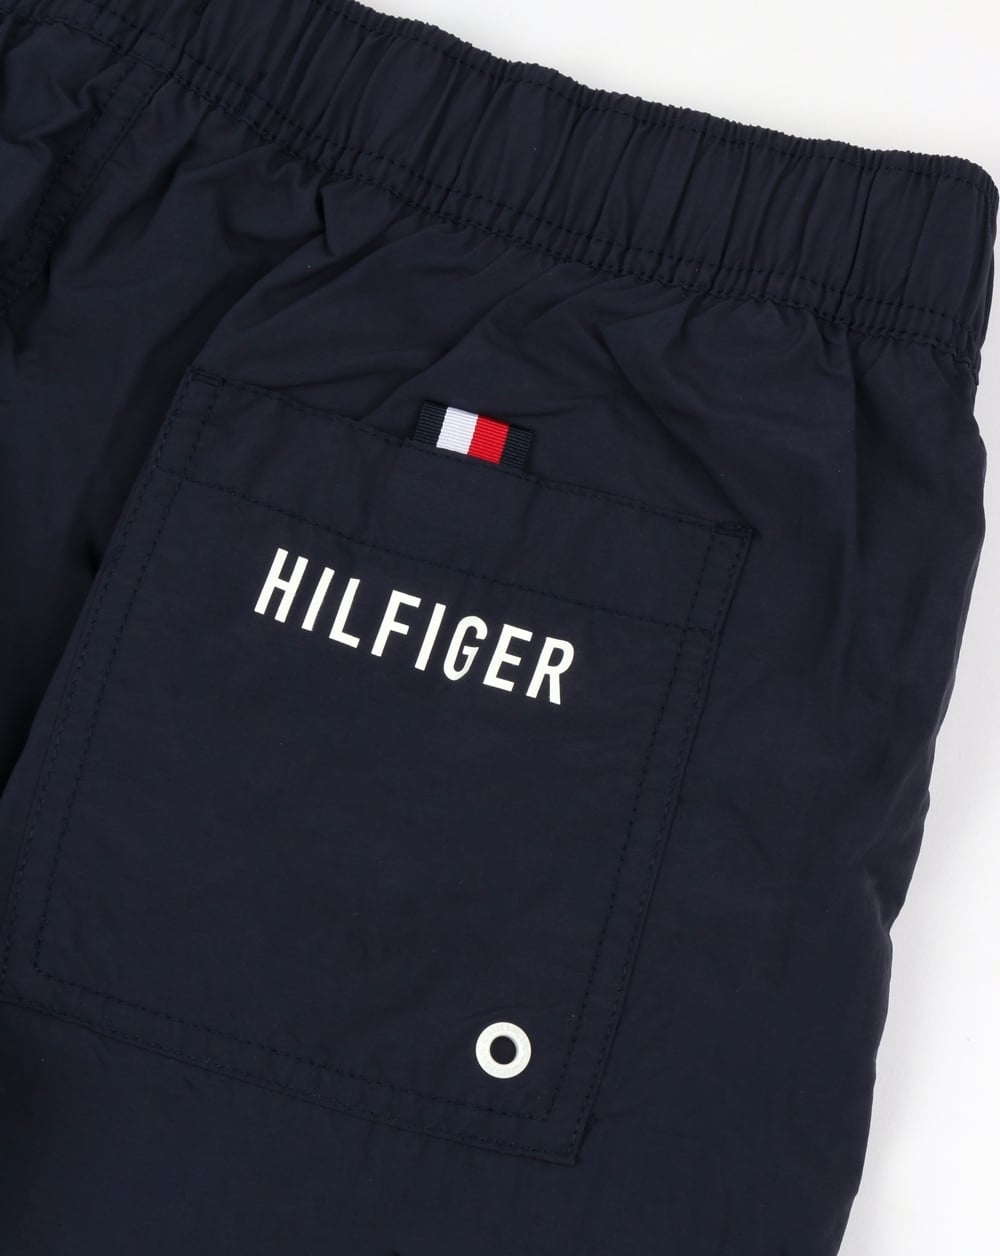 d1a3f89ad5 Tommy Hilfiger Linear Logo Swim Shorts Navy | 80s casual classics